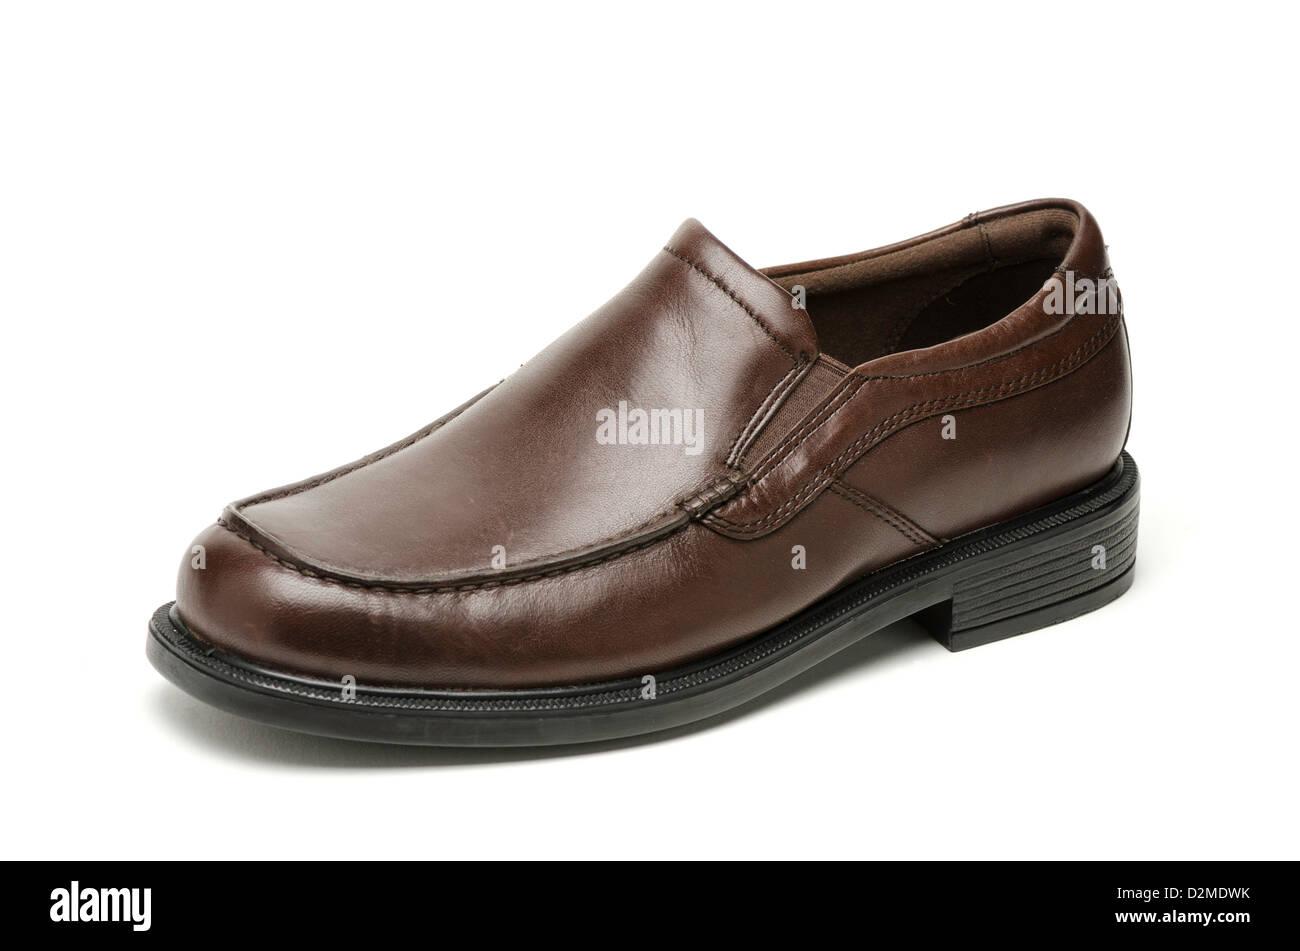 Man's shoe - Stock Image